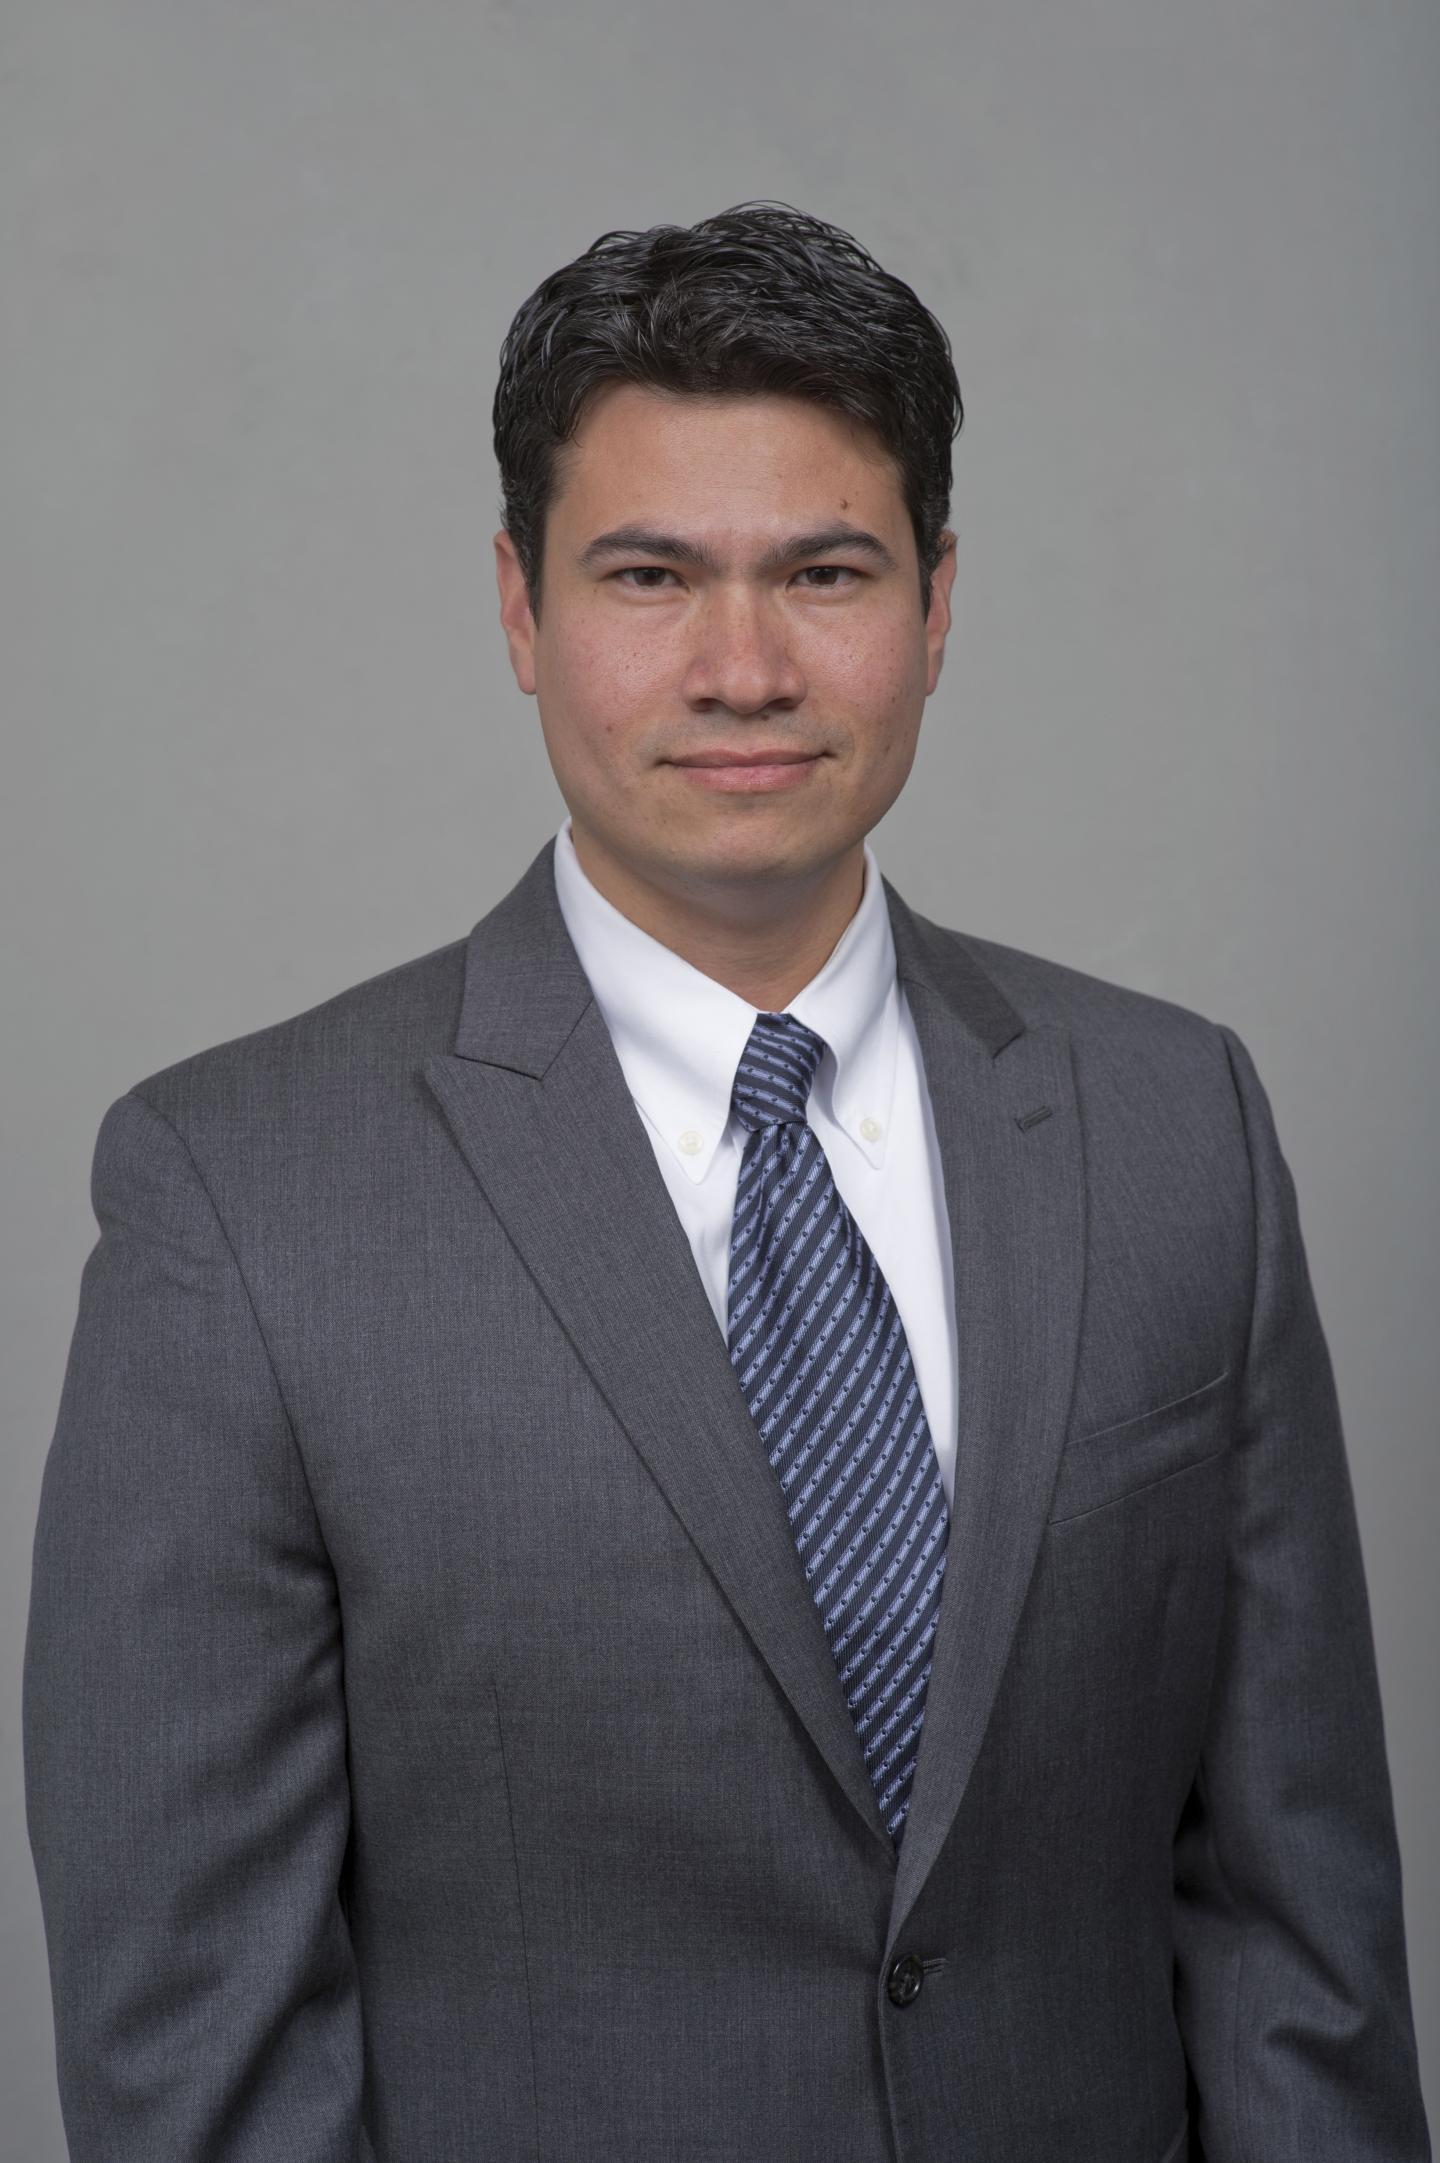 Servio H. Ramirez, Lewis Katz School of Medicine at Temple University